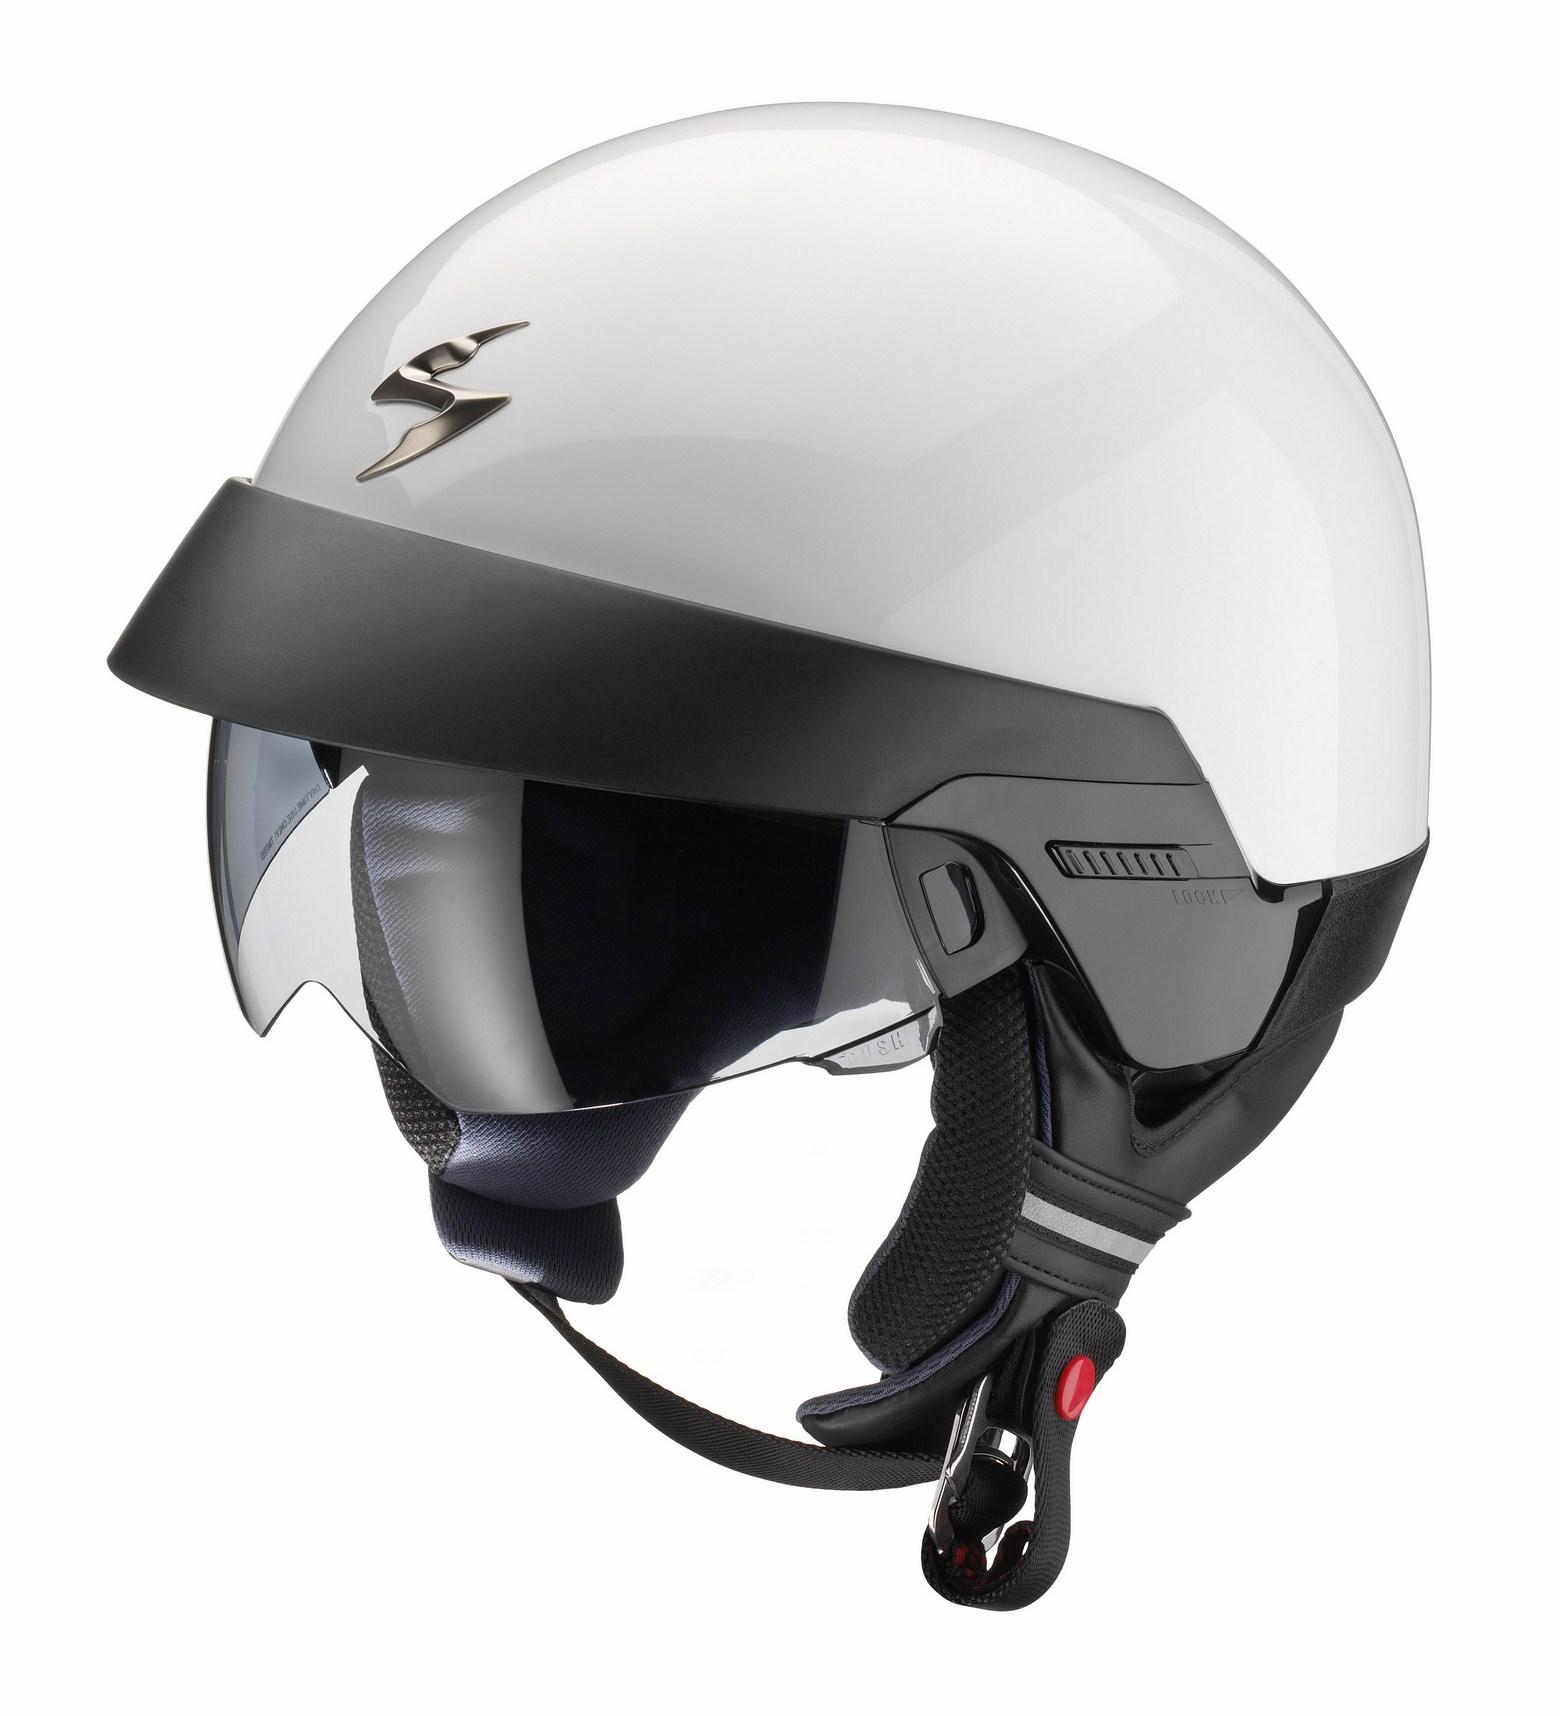 Scorpion Exo 100 jet helmet white